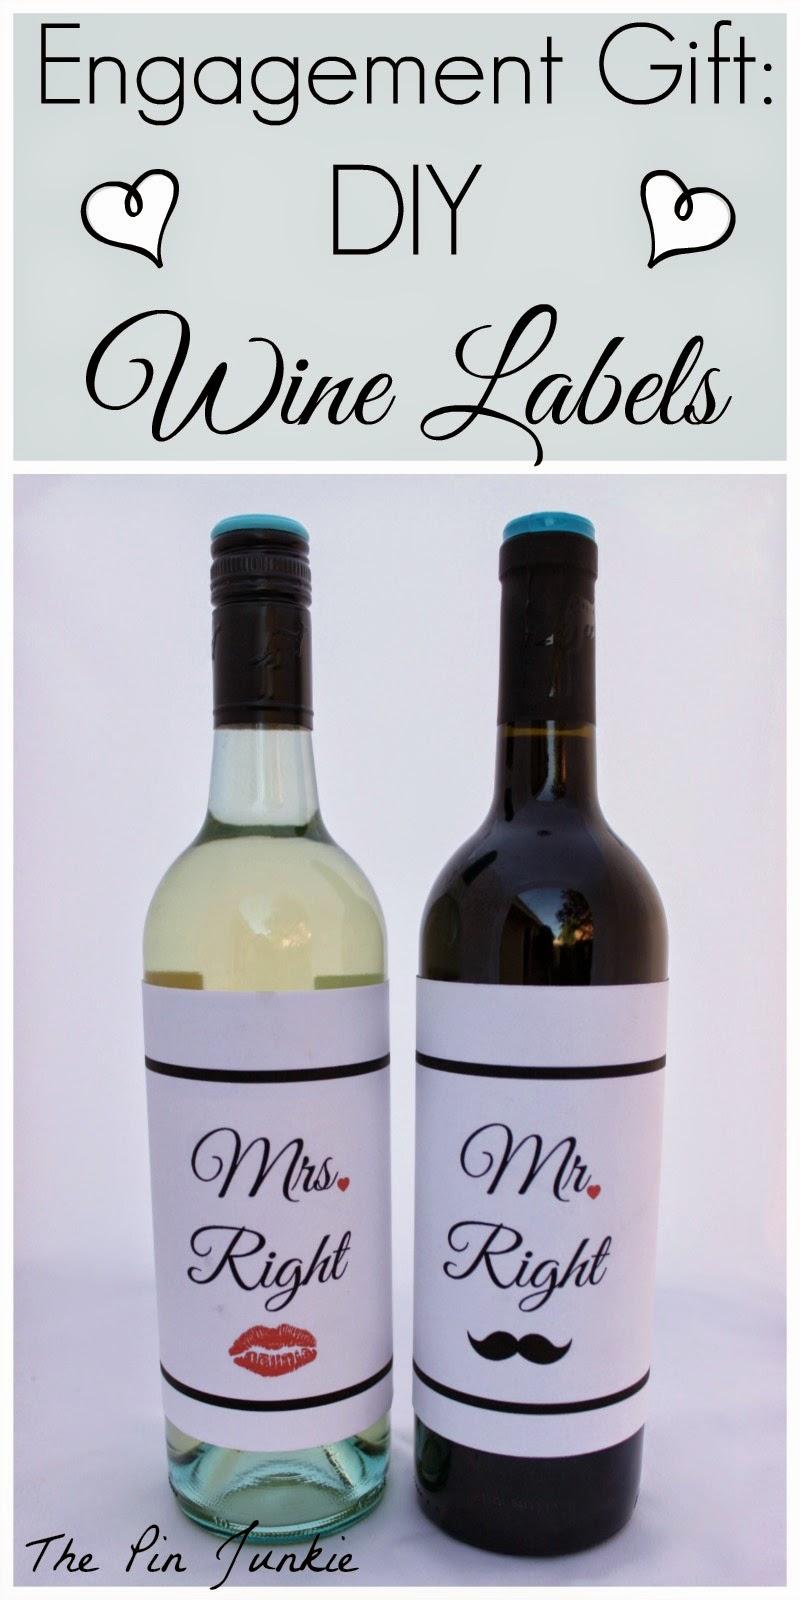 Engagement Gift: DIY Wine Labels